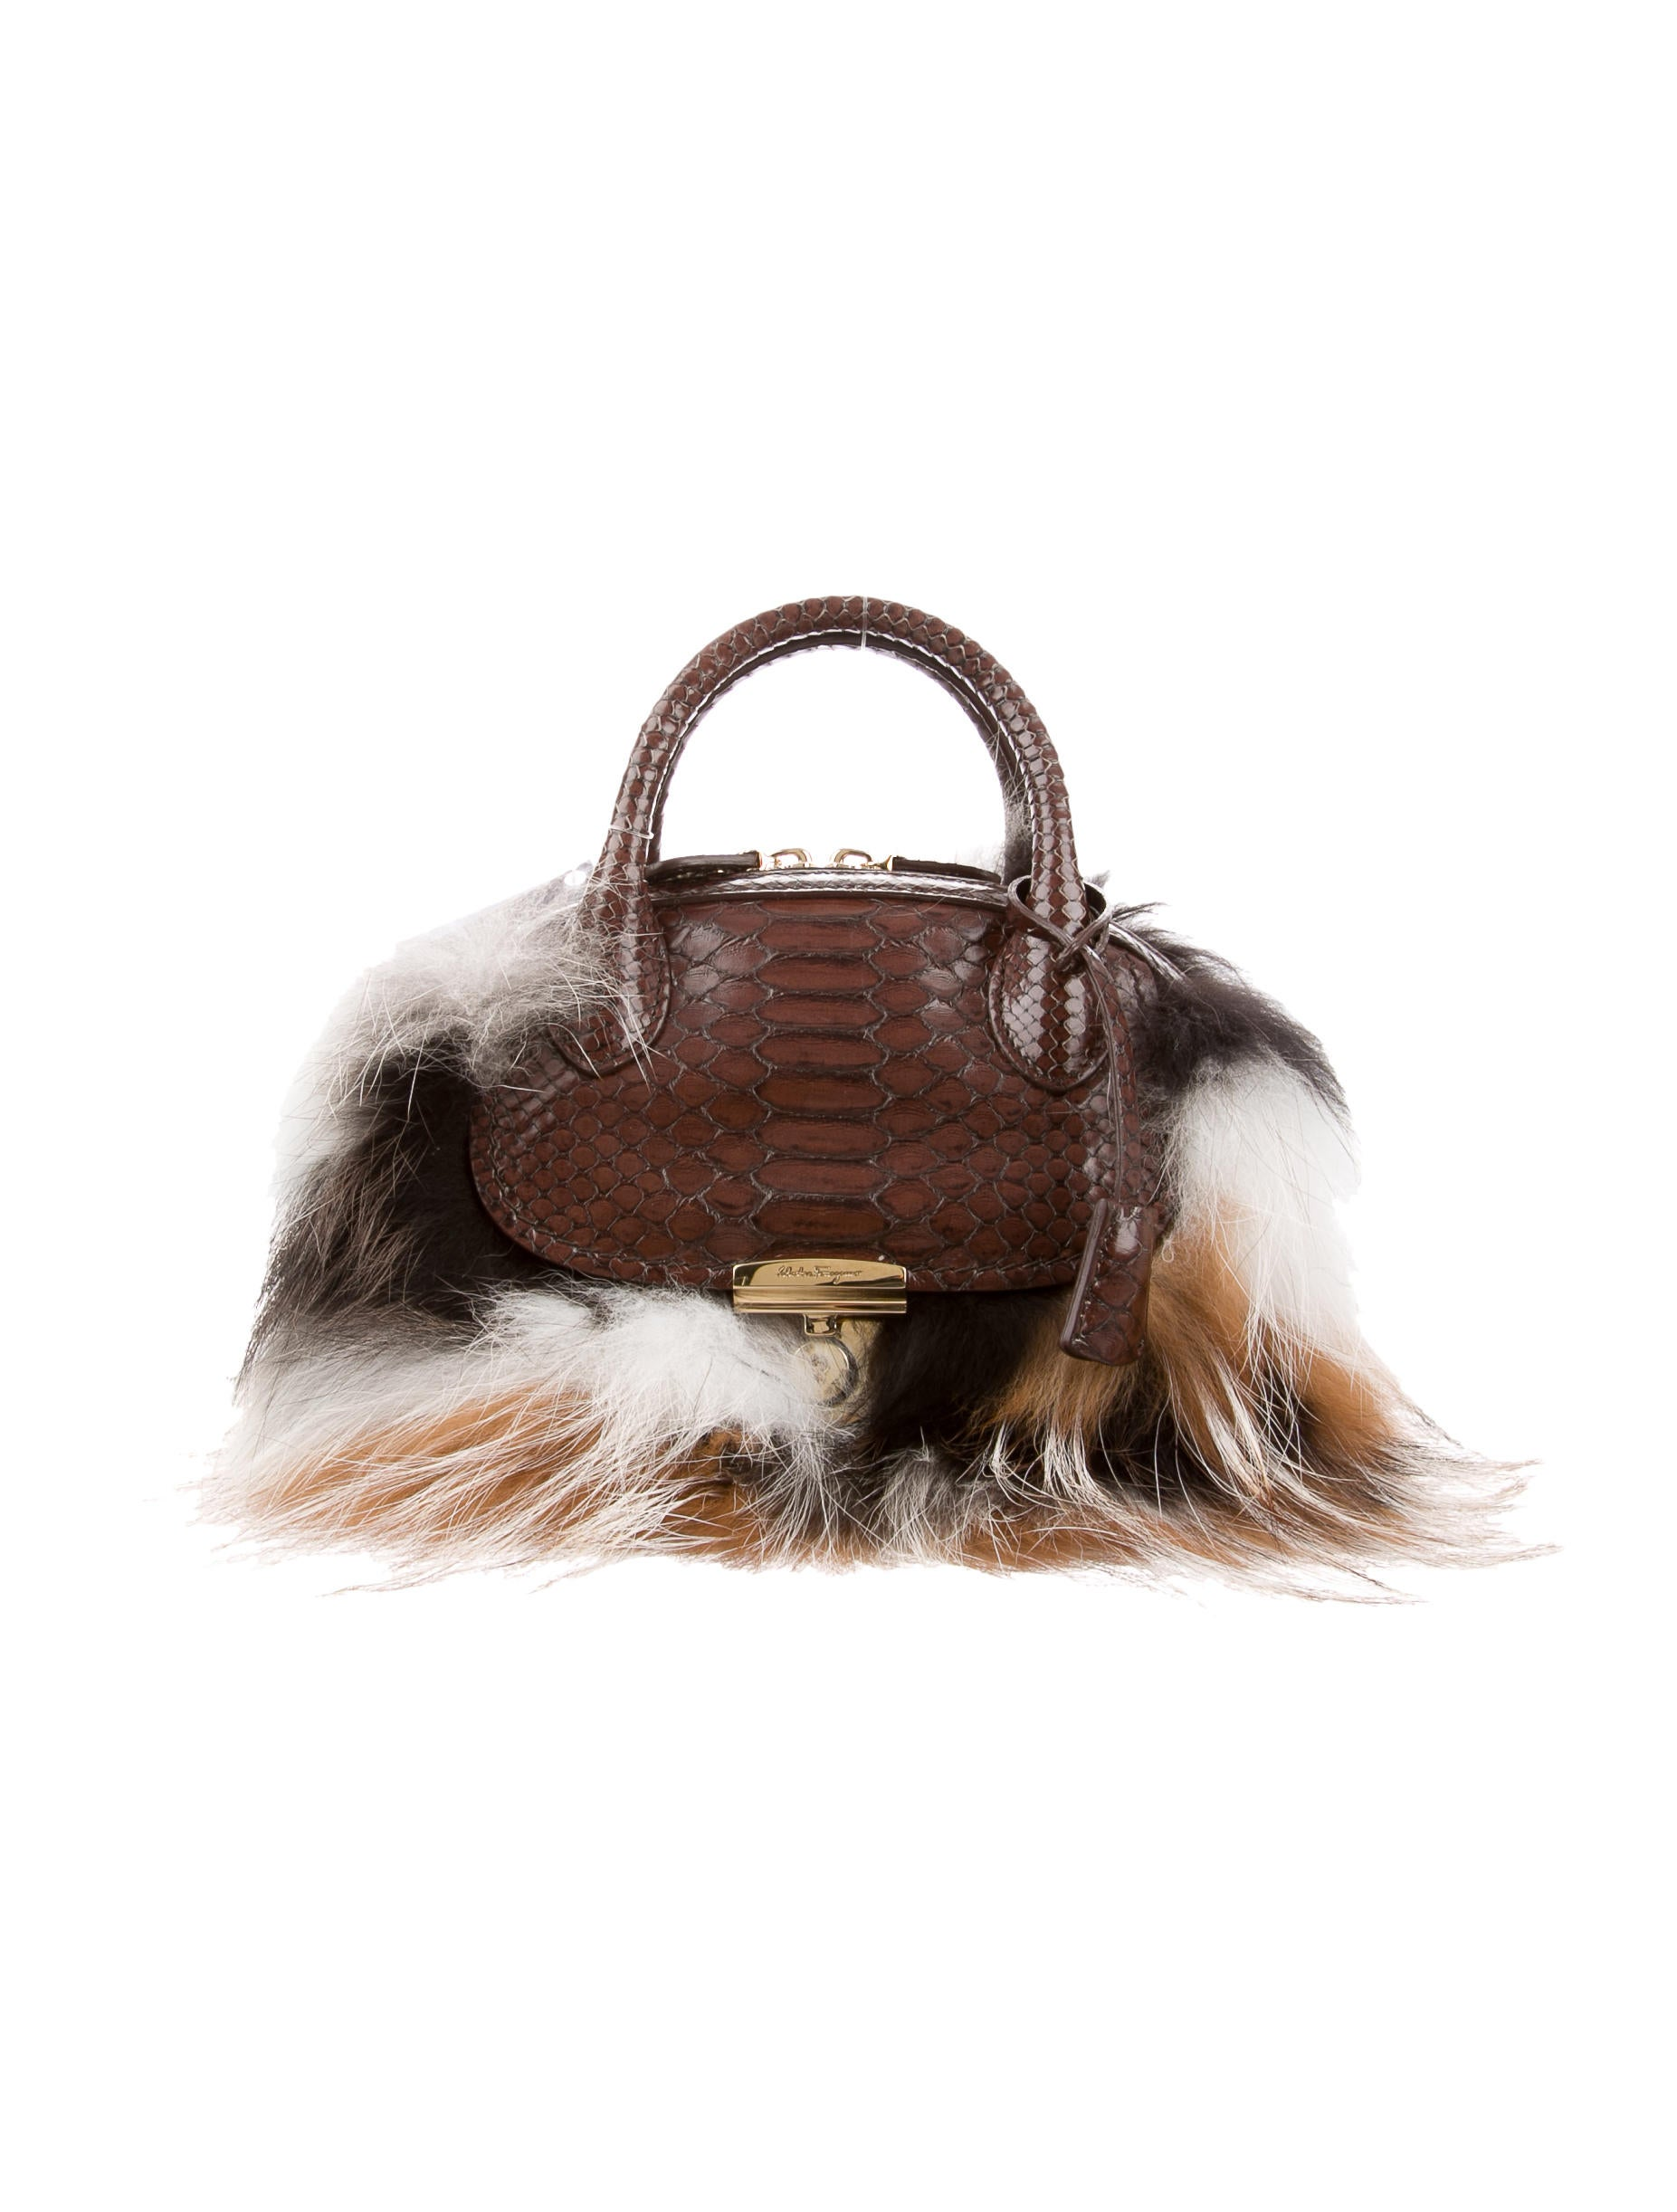 76afbfb89706 Salvatore Ferragamo Python   Fur Mini Fiamma Bag - Handbags ...